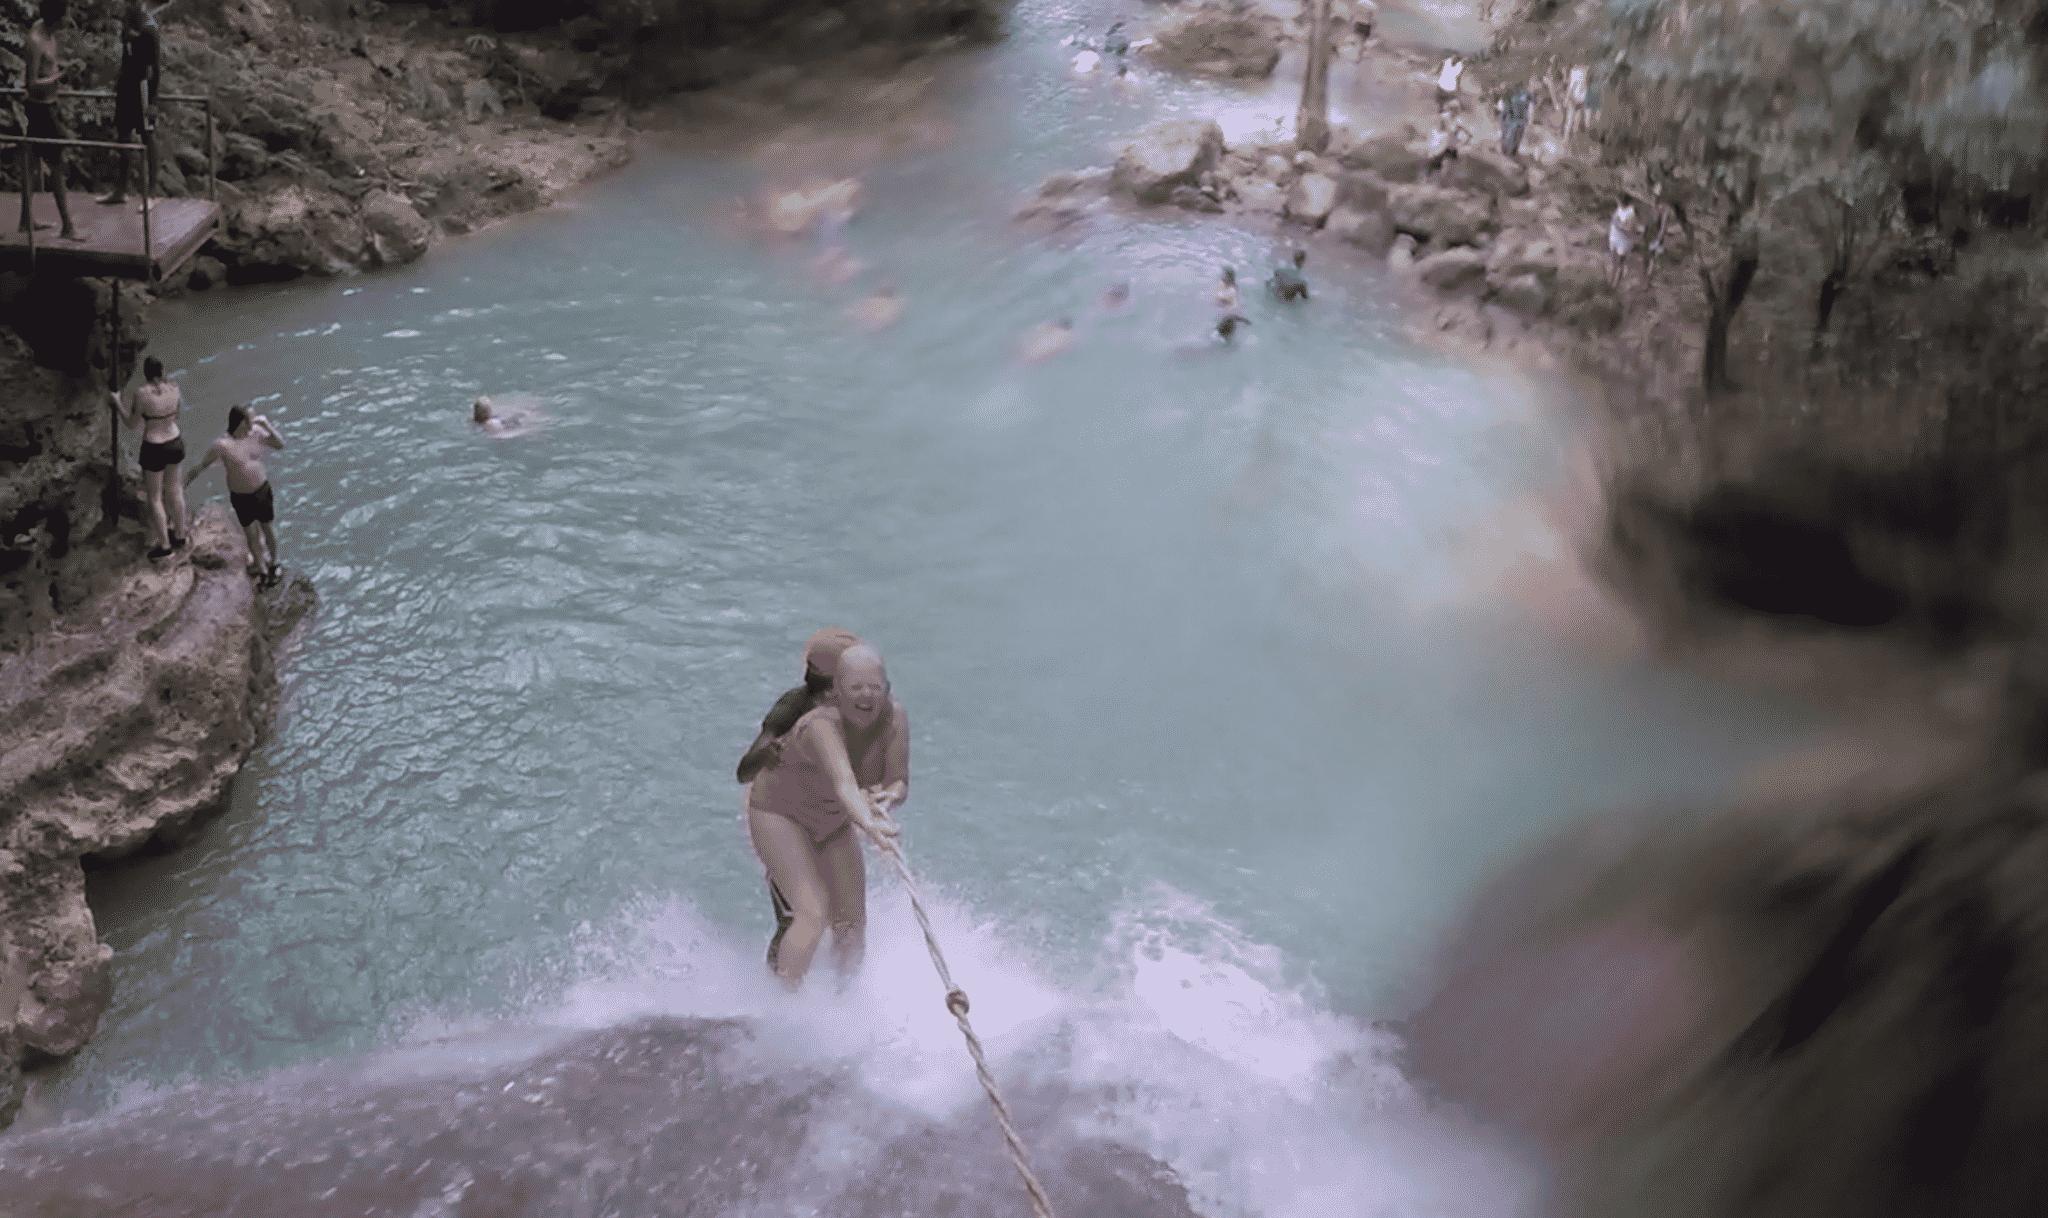 jamaica-irie-blue-hole-melanie-ceo-rare-finds-travel-waterfall-rappel